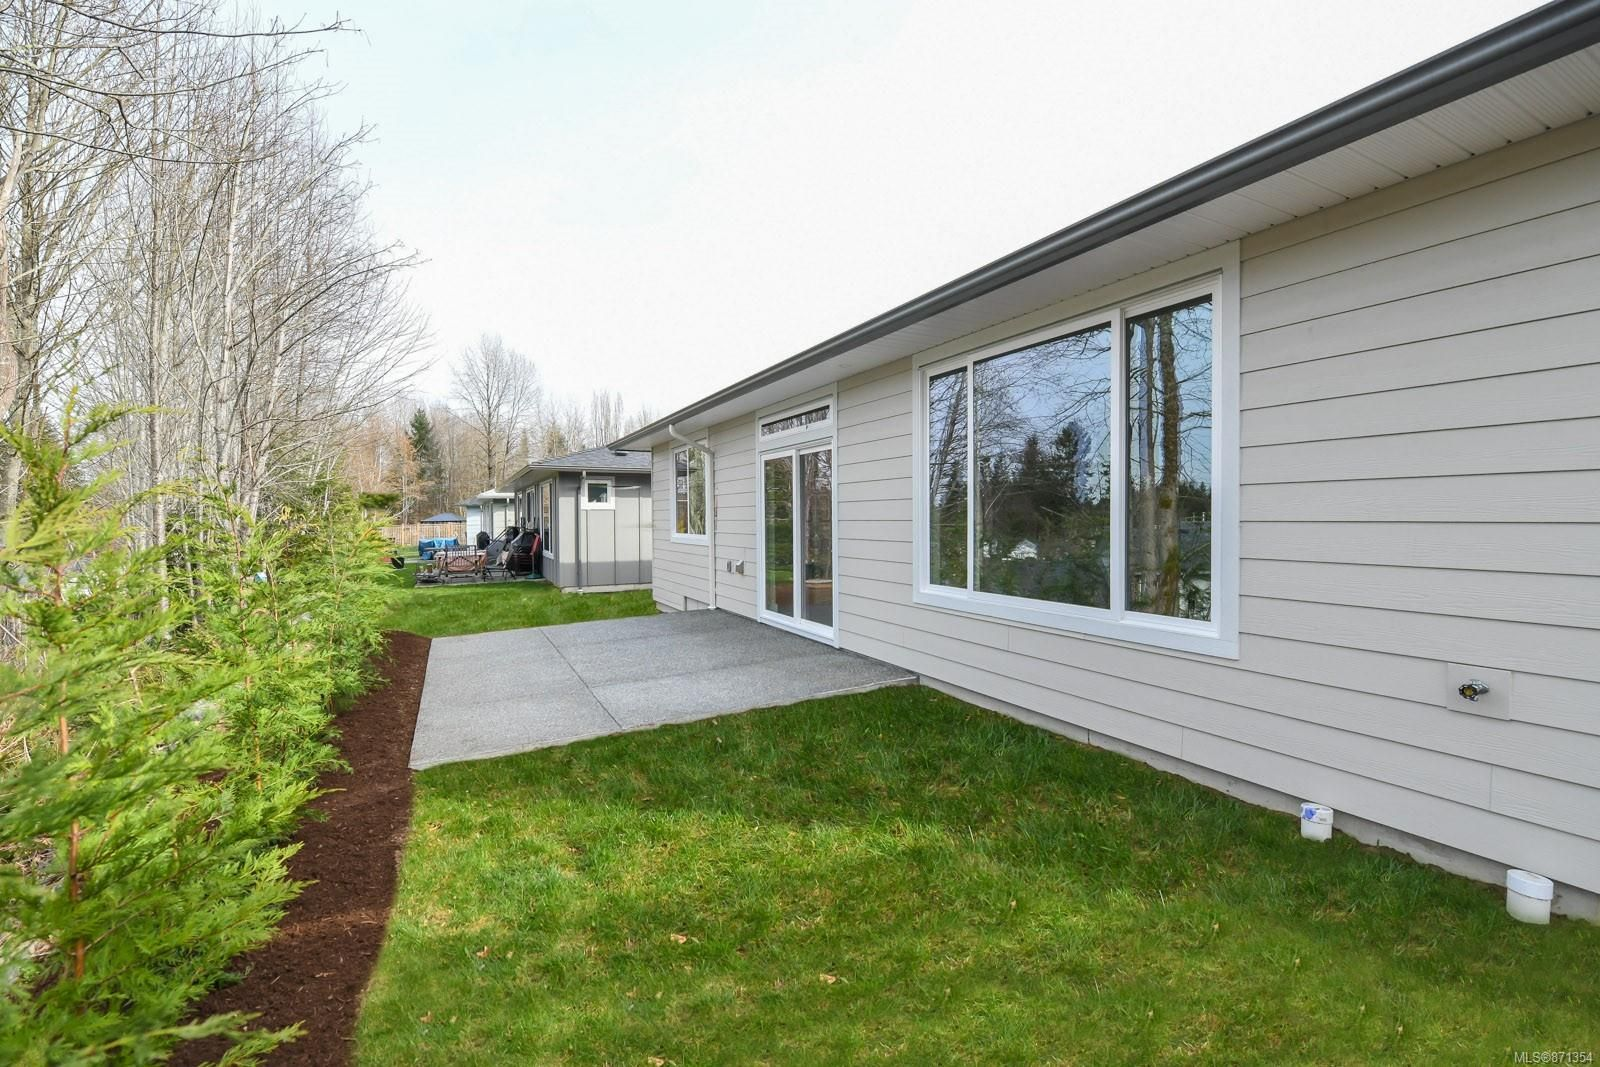 Photo 29: Photos: 68 Grayhawk Pl in : CV Courtenay City House for sale (Comox Valley)  : MLS®# 871354